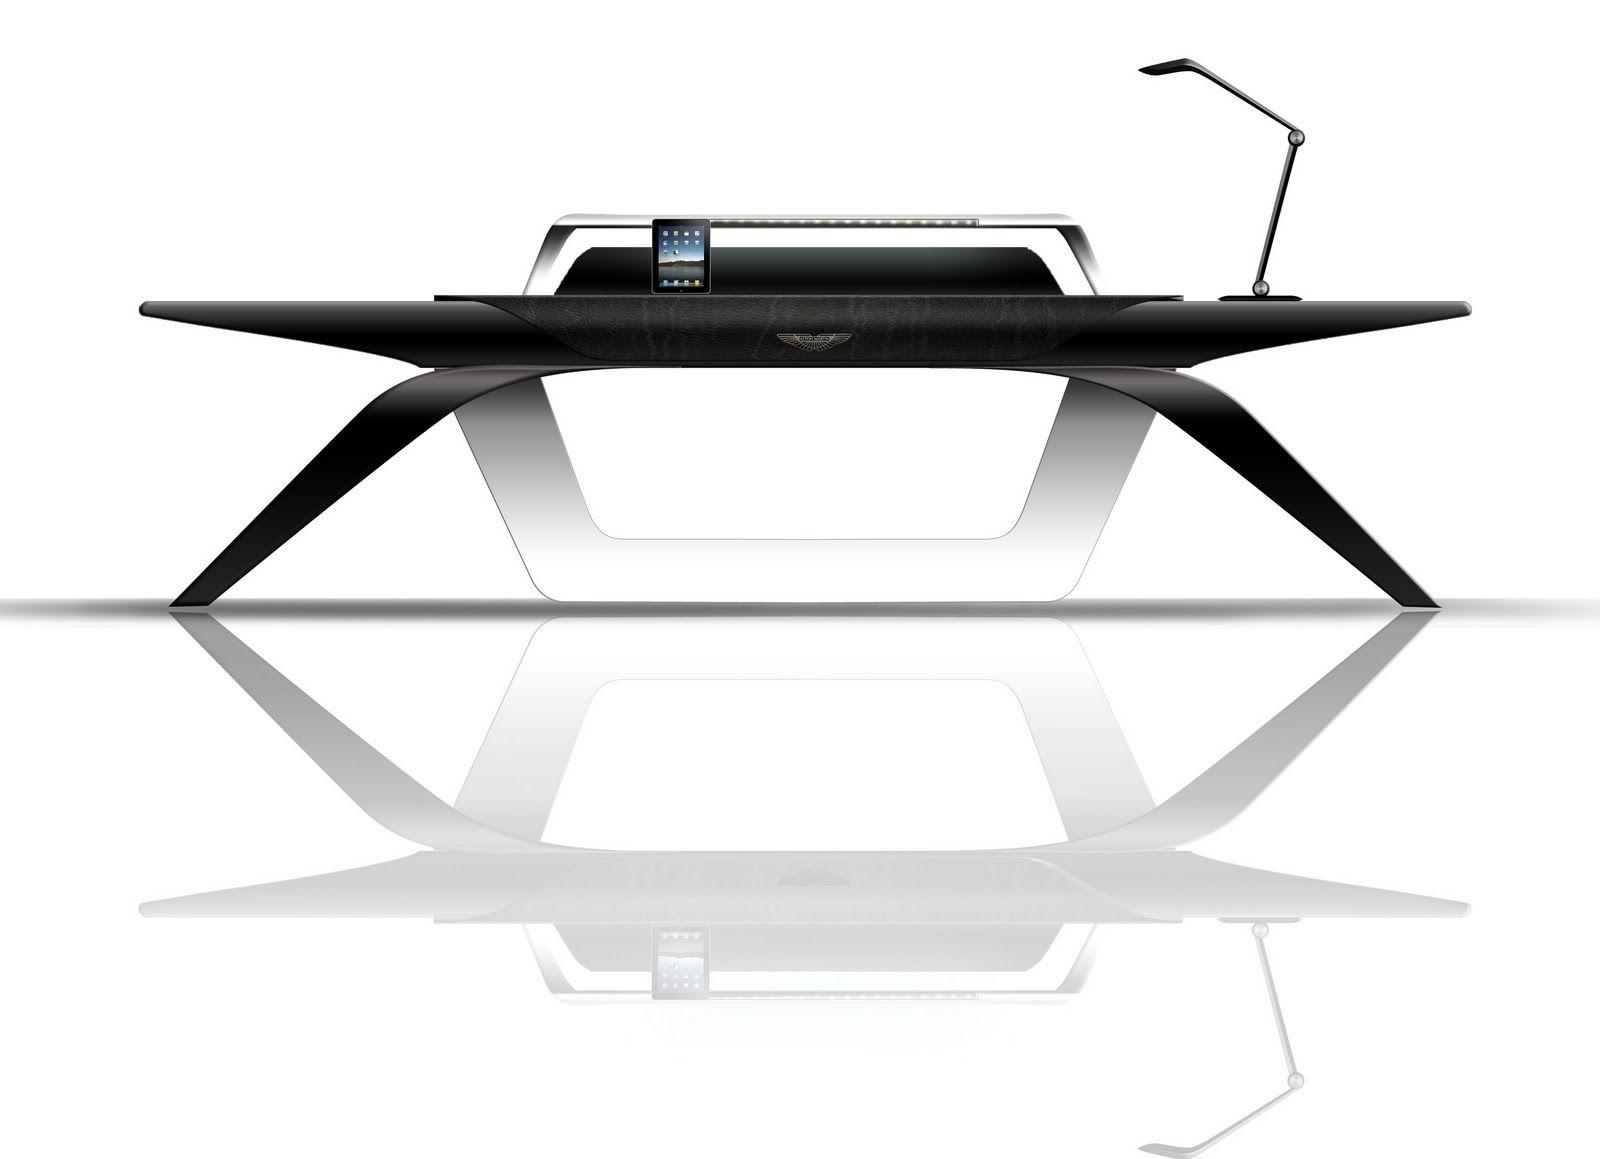 25 Best Ideas about Cool Office Desk on Pinterest  Cool office